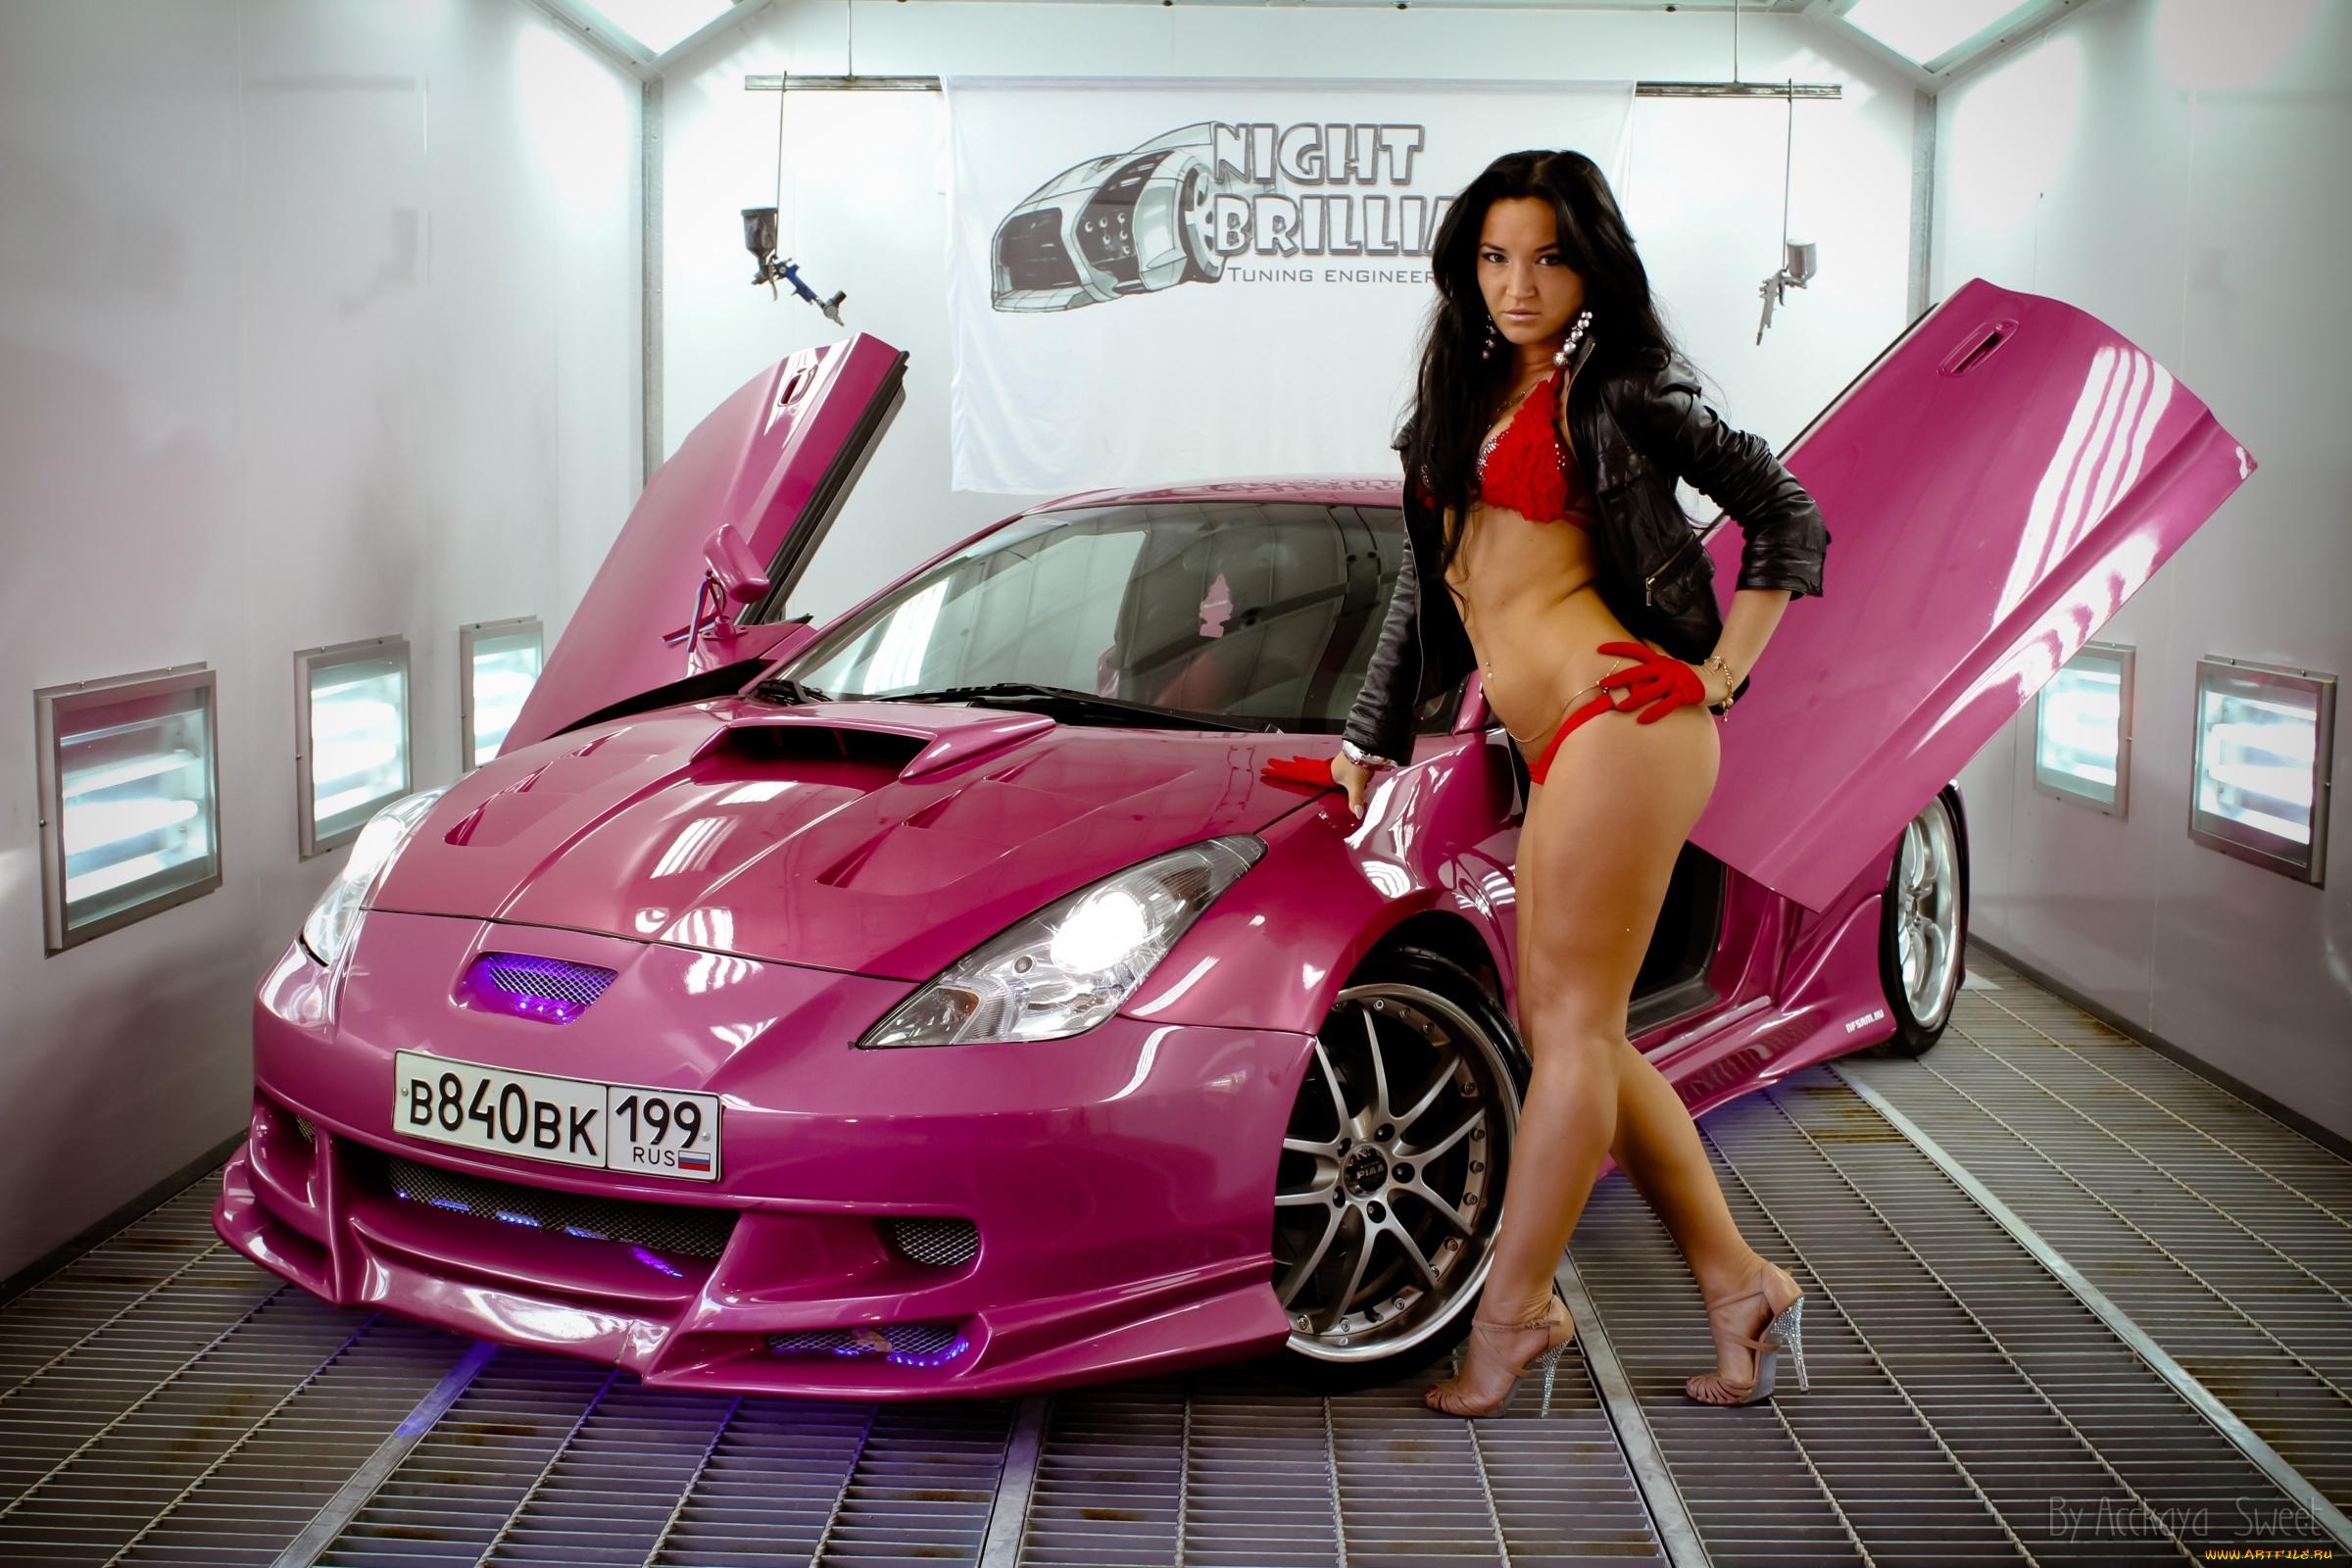 Import tuner girls naked — img 6